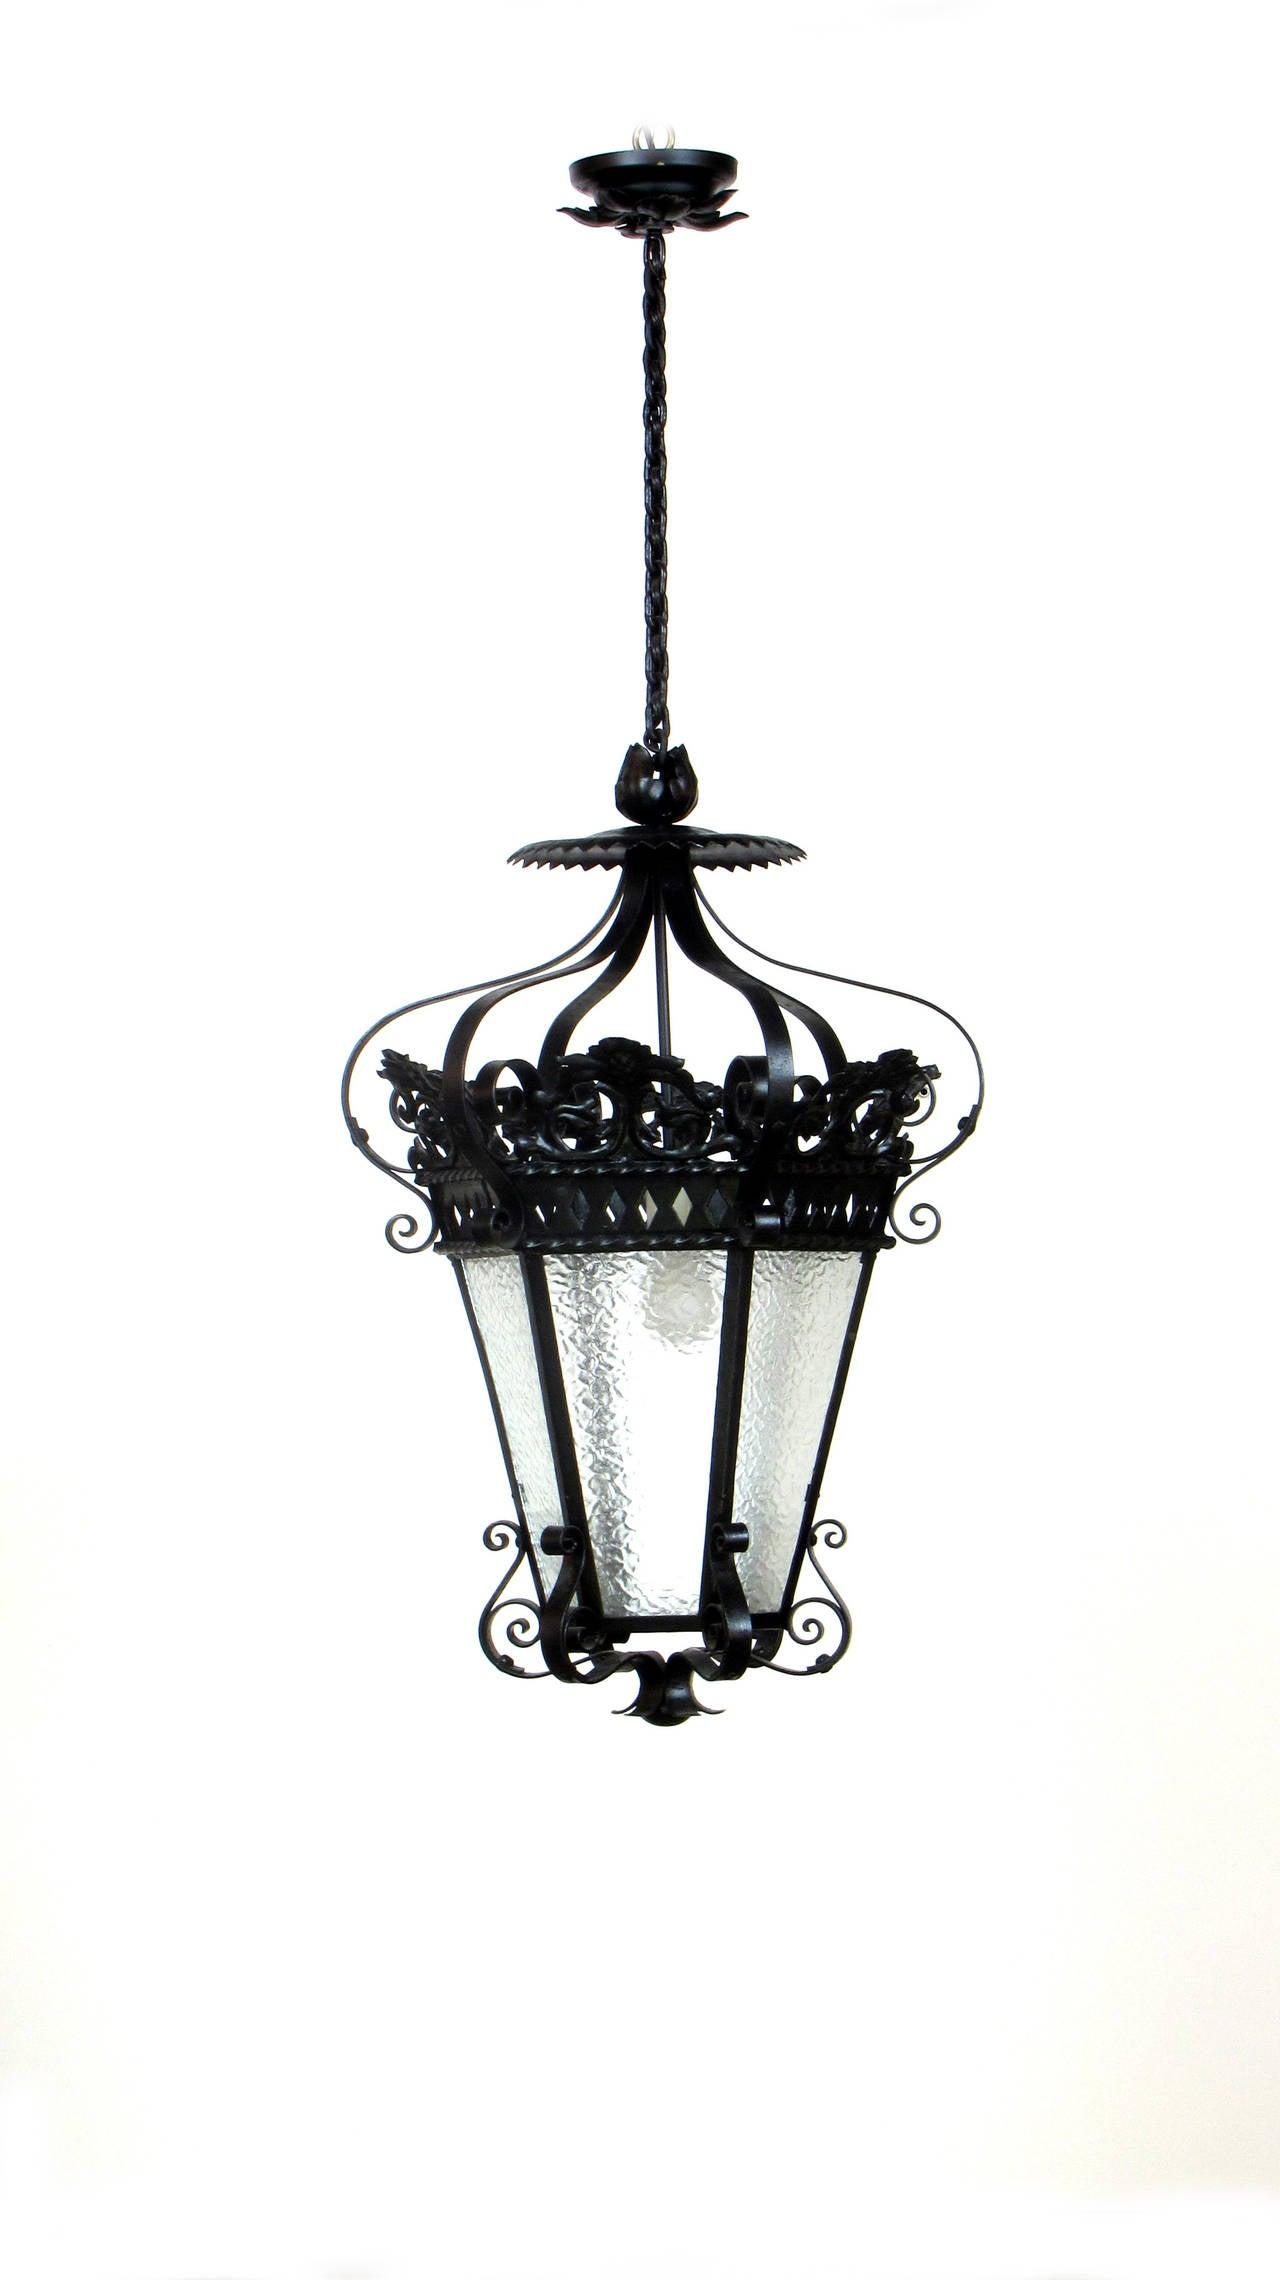 Wrought Iron And Glass Lantern At 1stdibs